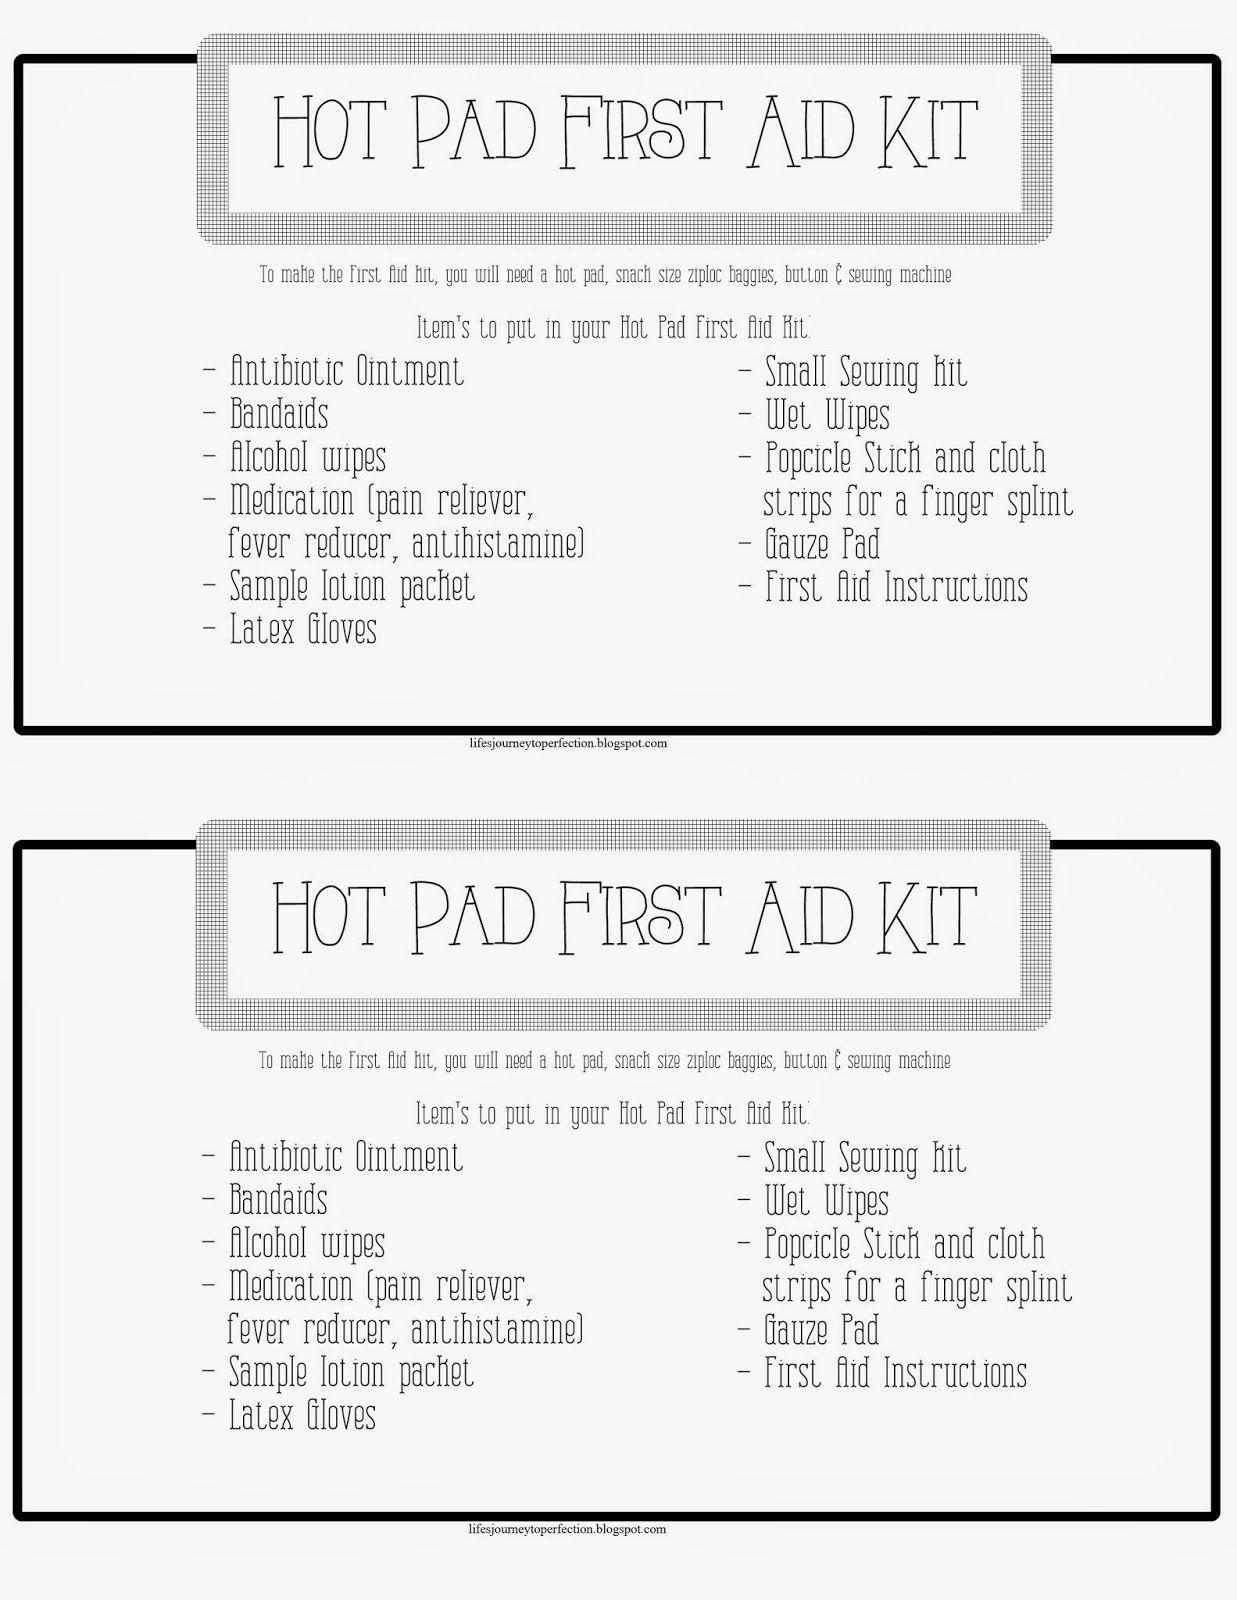 Emergency Preparedness Super Saturday Ideas (Relief Society